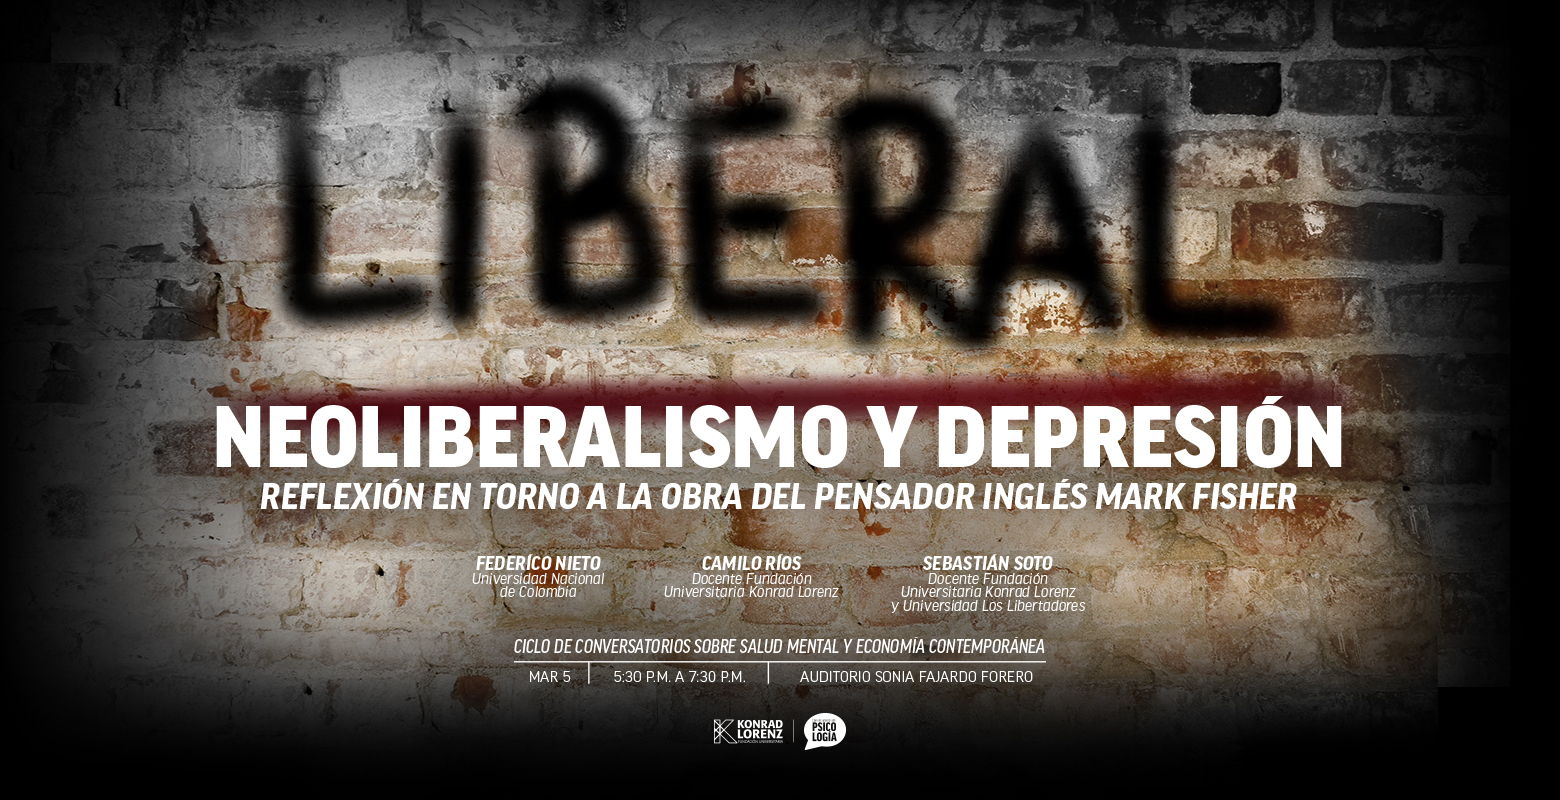 Neoliberalismo y depresión - Segundo Conversatorio